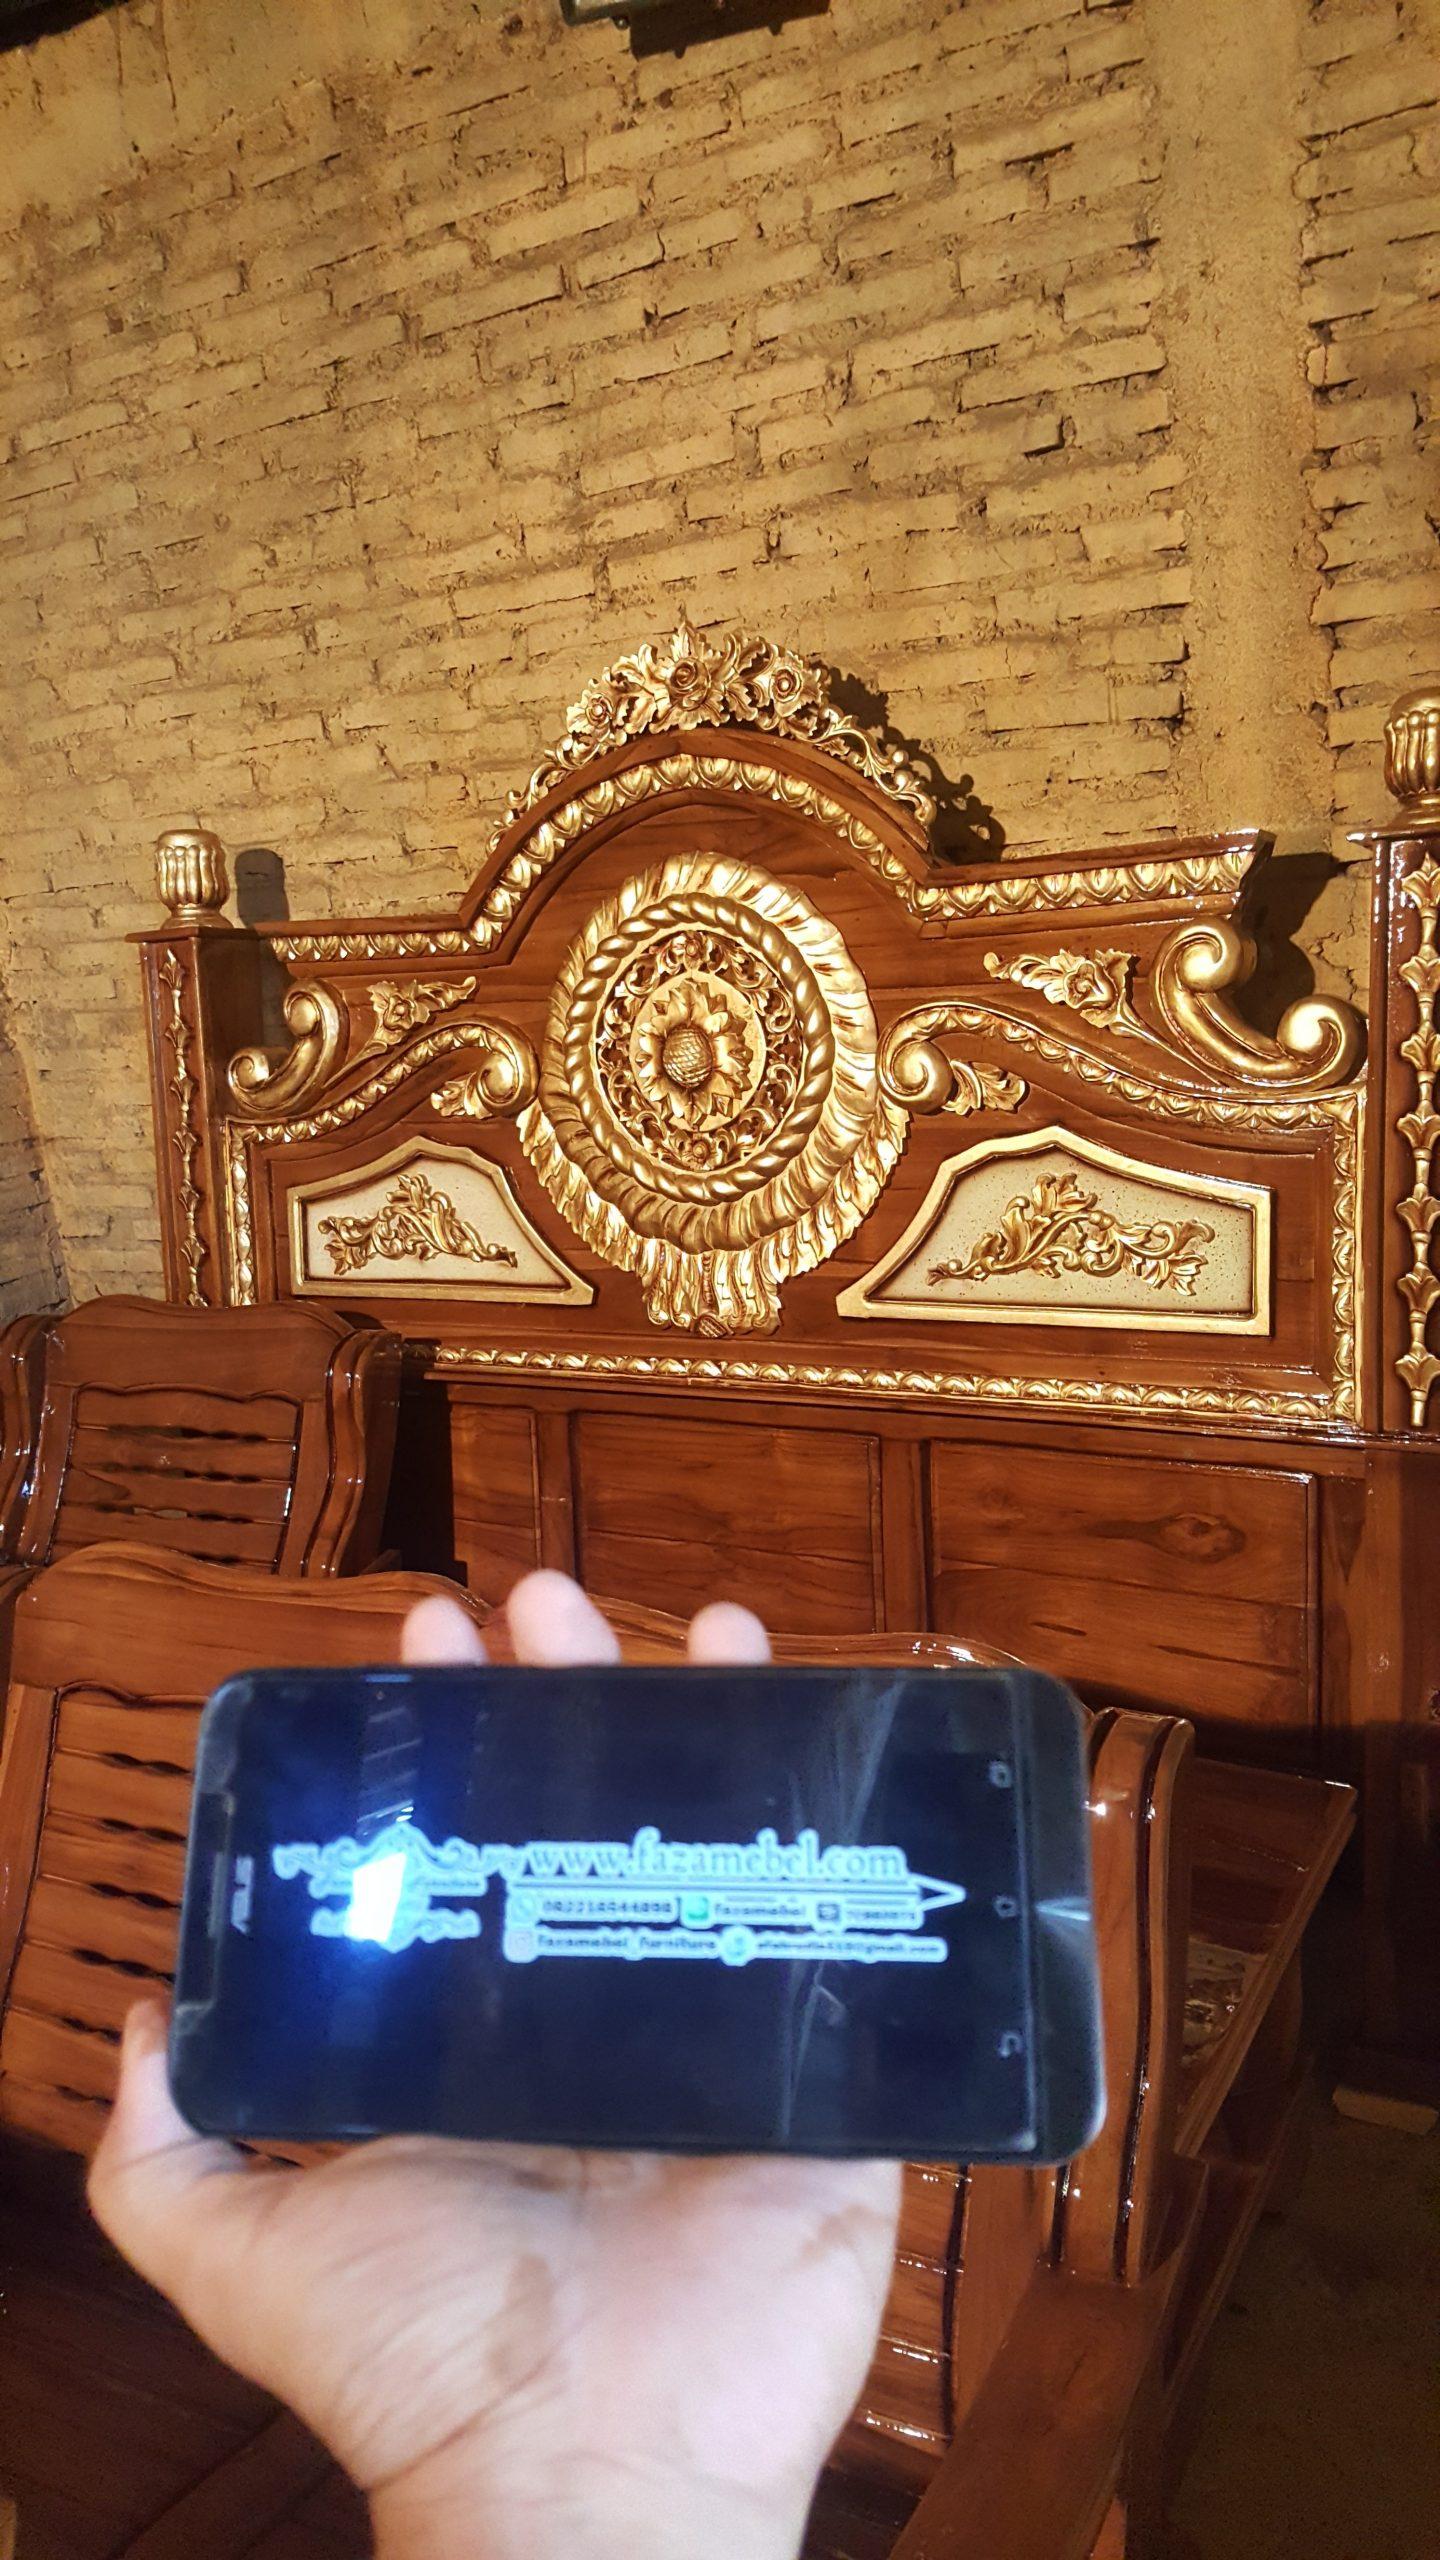 tempat-tidur-set-kayu-jati-mewah-ukir-jepara (14)